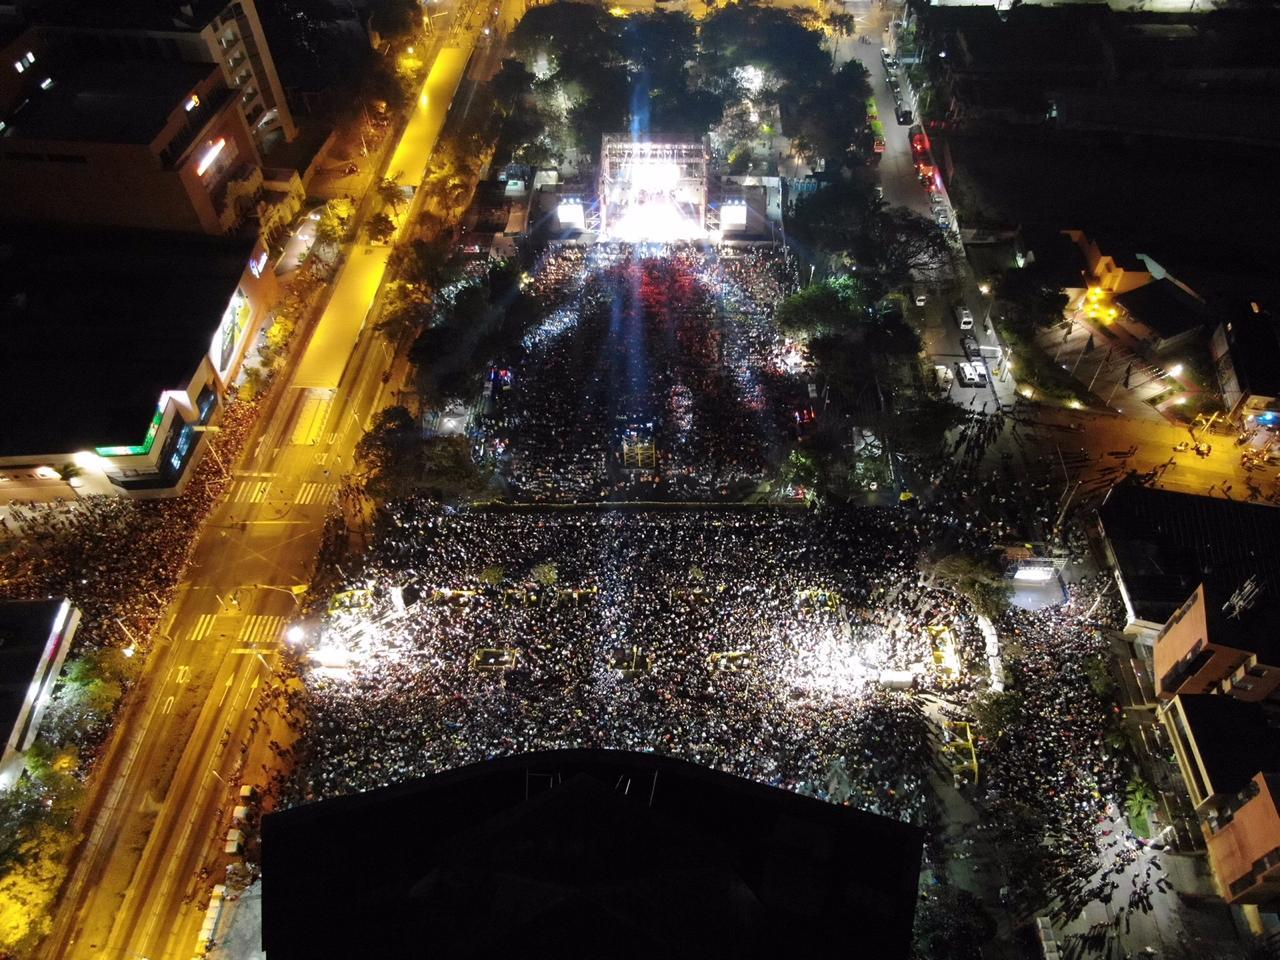 La Reina del Carnaval declaró a Barranquilla estado 'Cambambero'